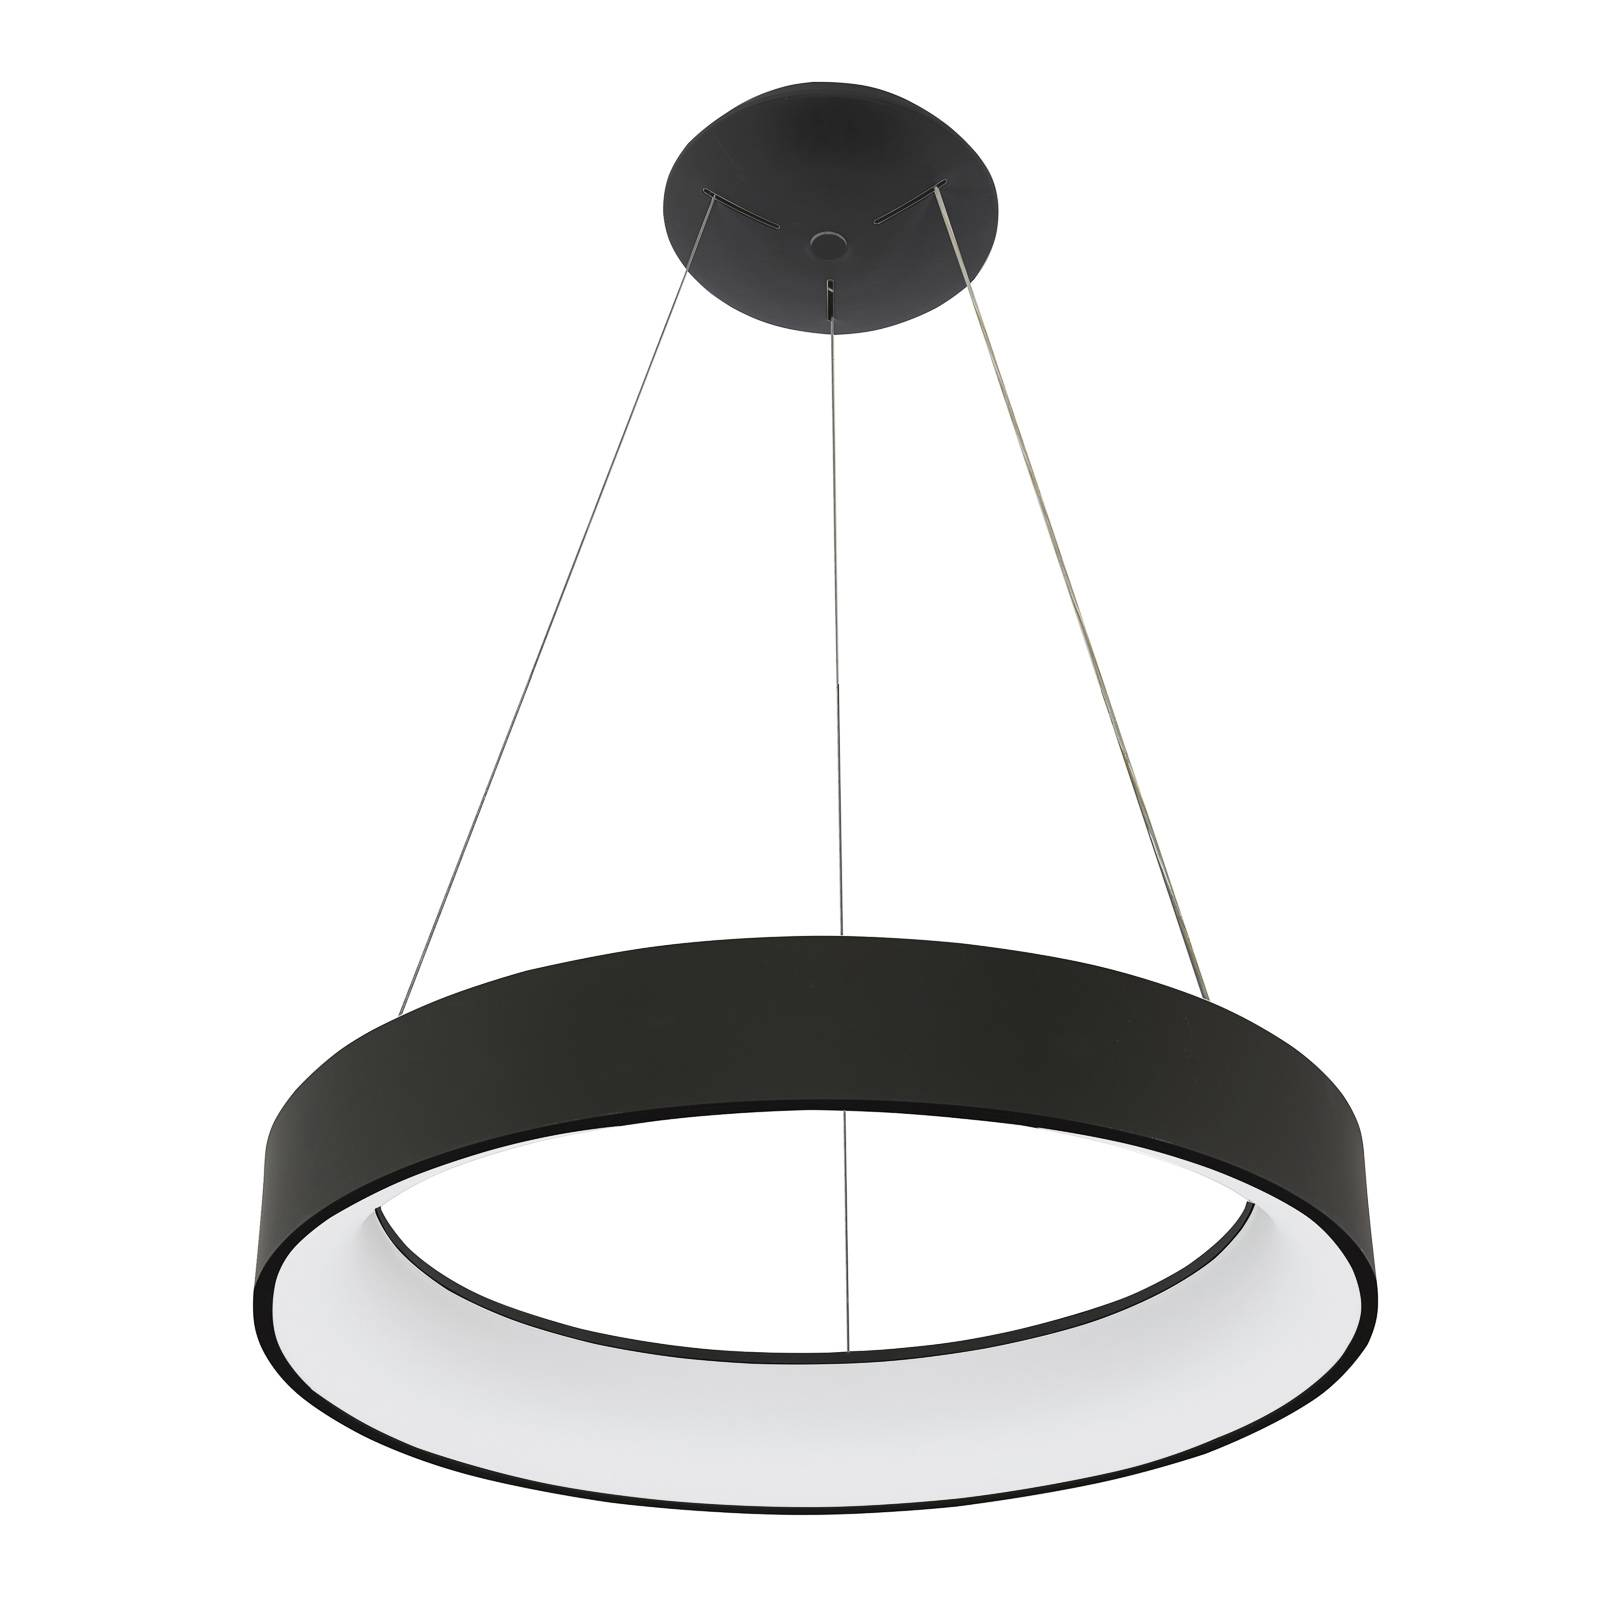 Arcchio Aleksi -LED-riippuvalaisin, Ø 60 cm pyöreä